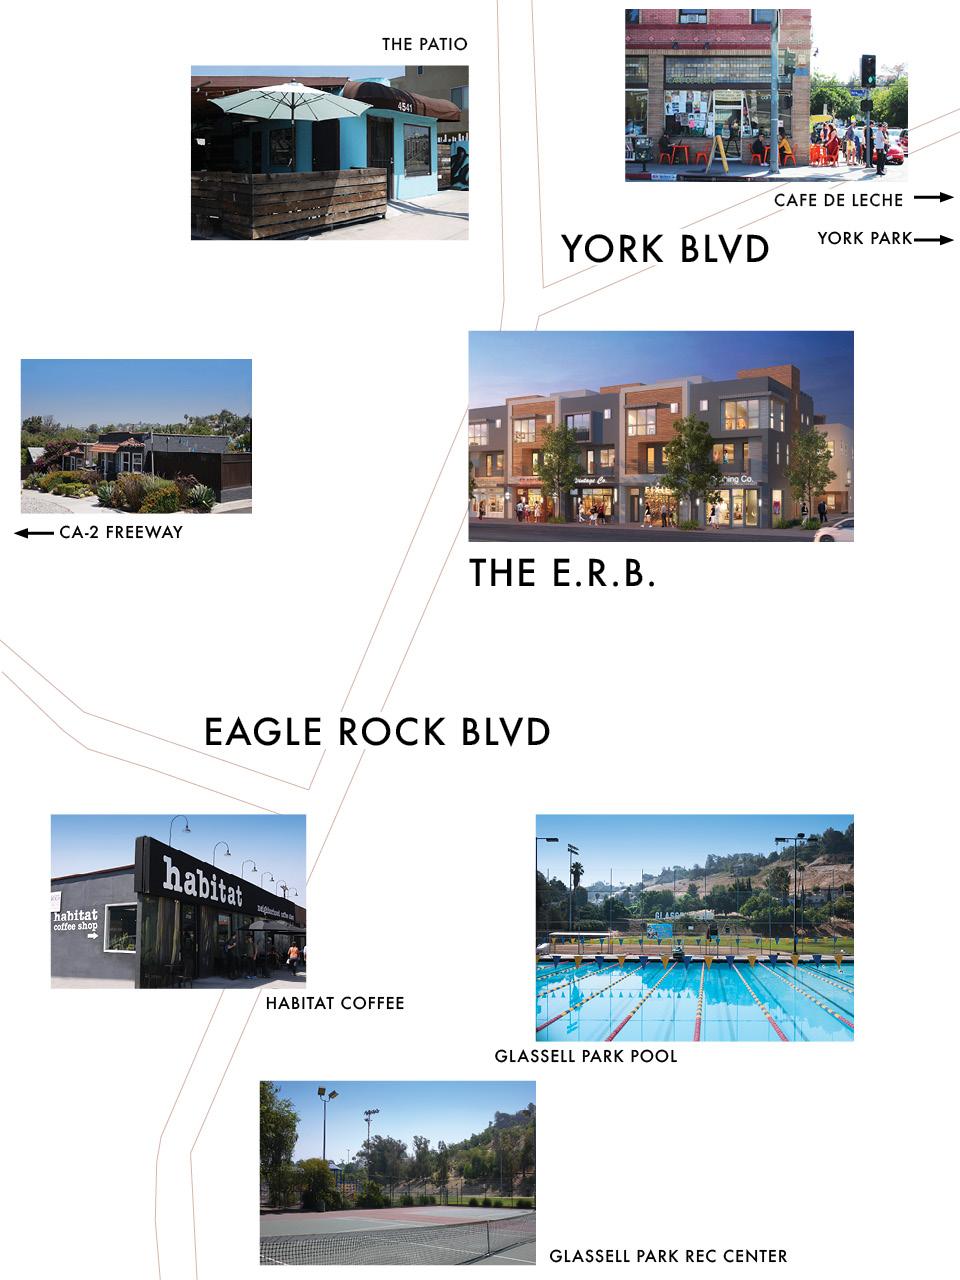 erb_neighborhood_page_images2.jpg